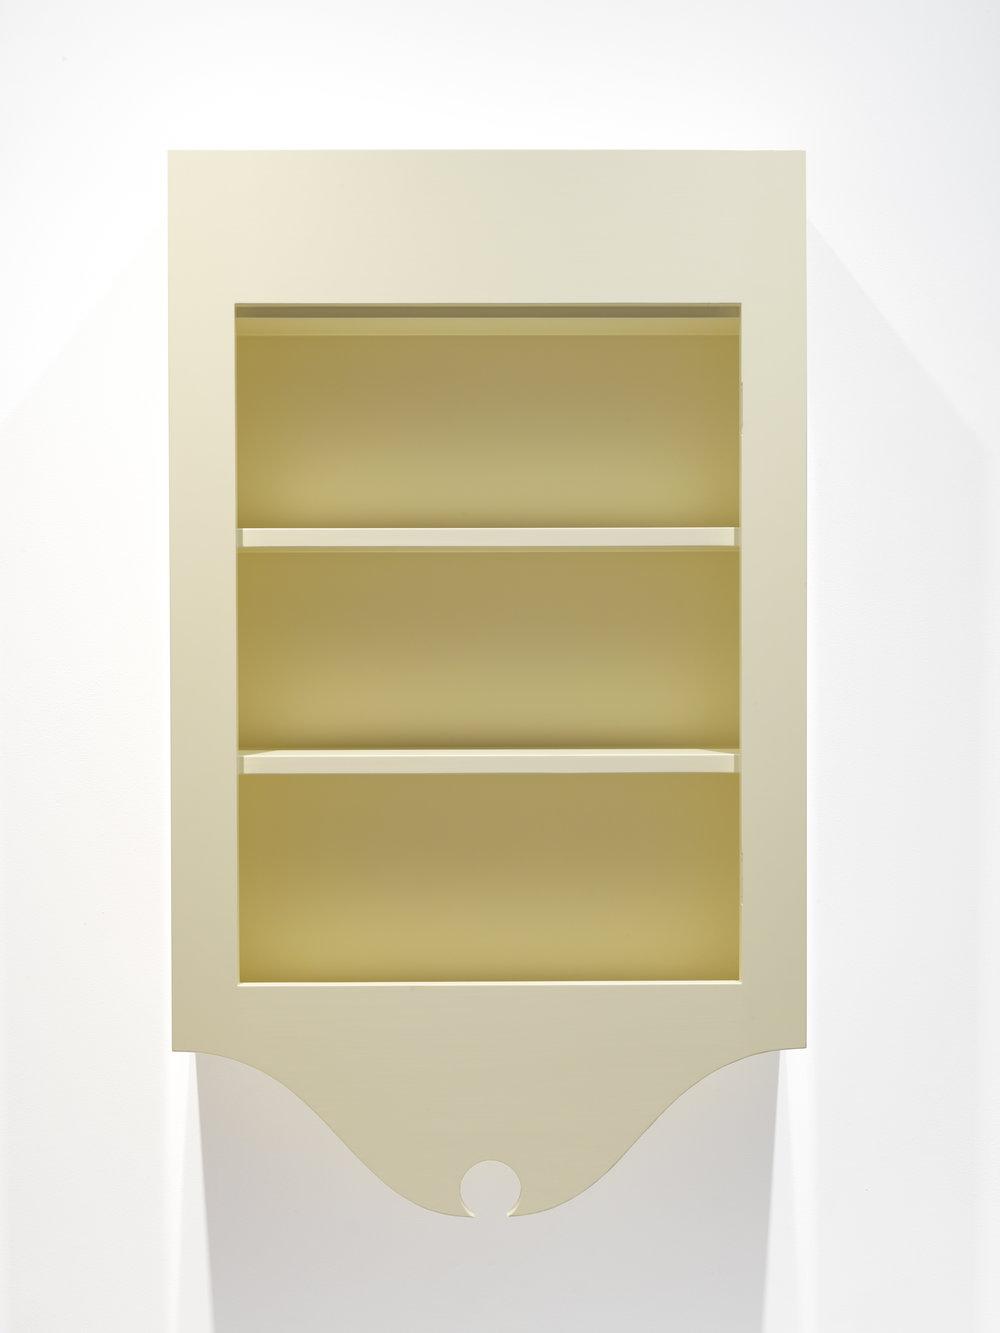 Curio Cabinet, 2008